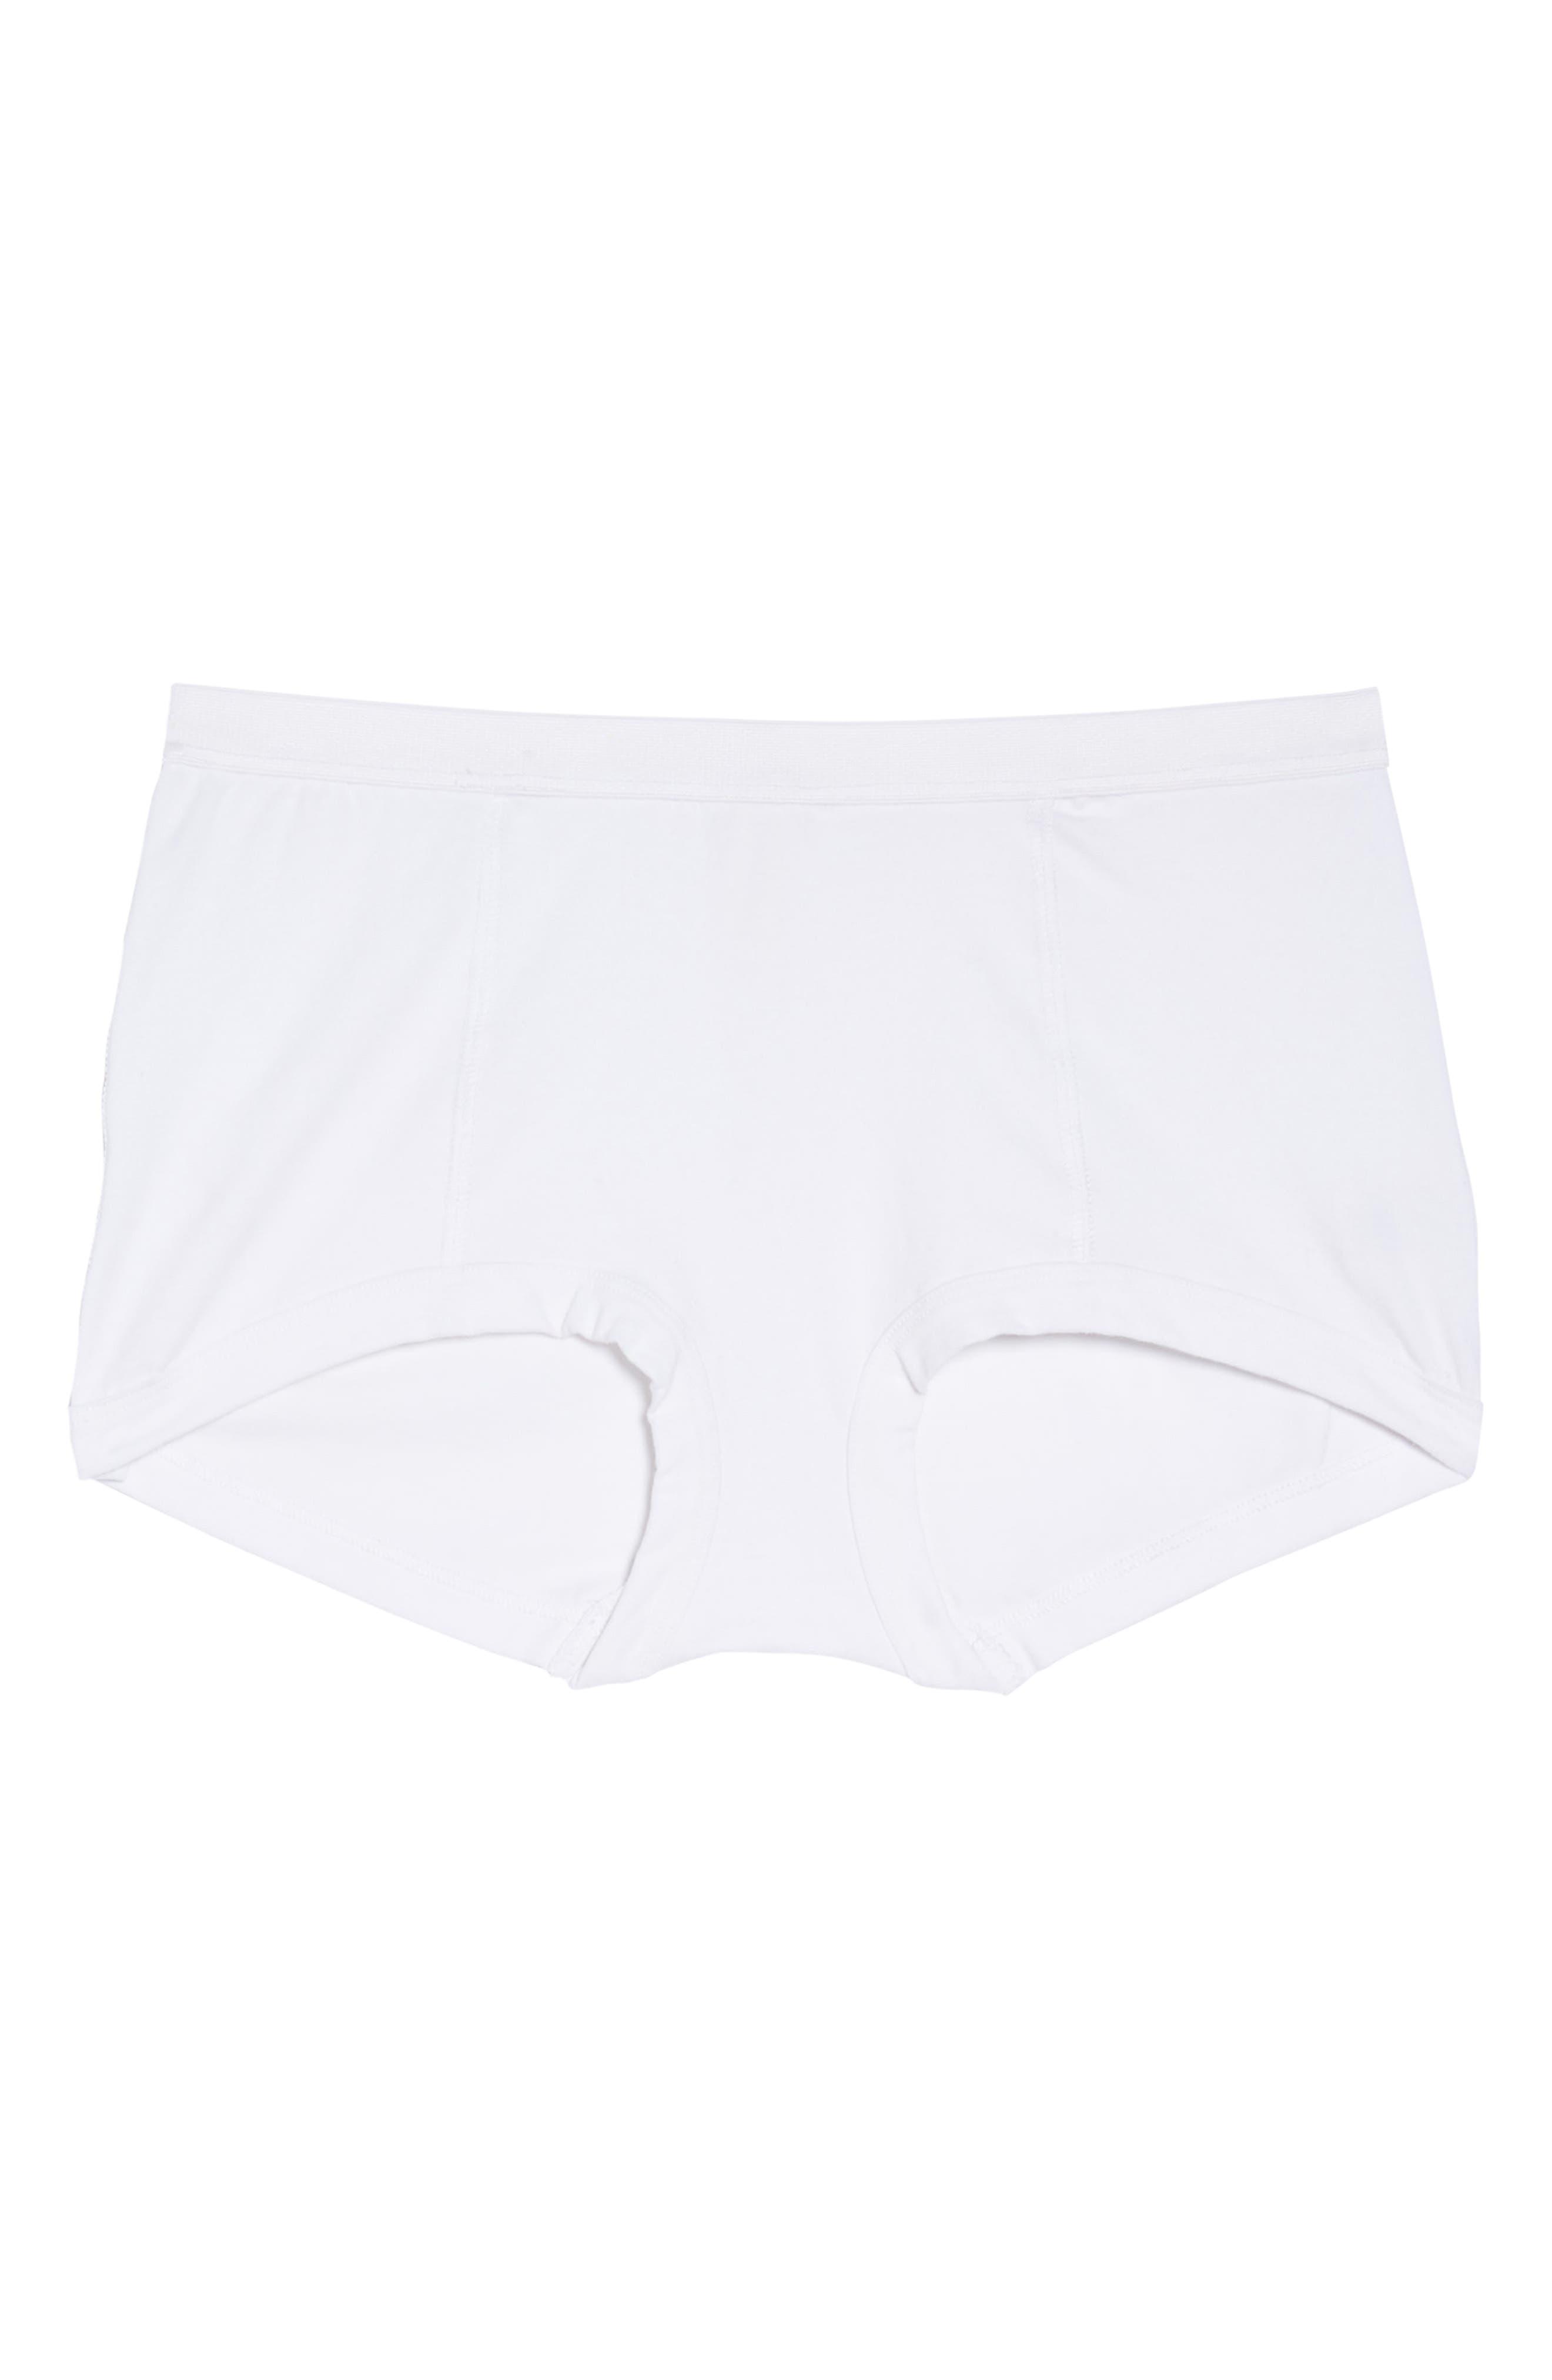 Peony Shorts,                             Alternate thumbnail 11, color,